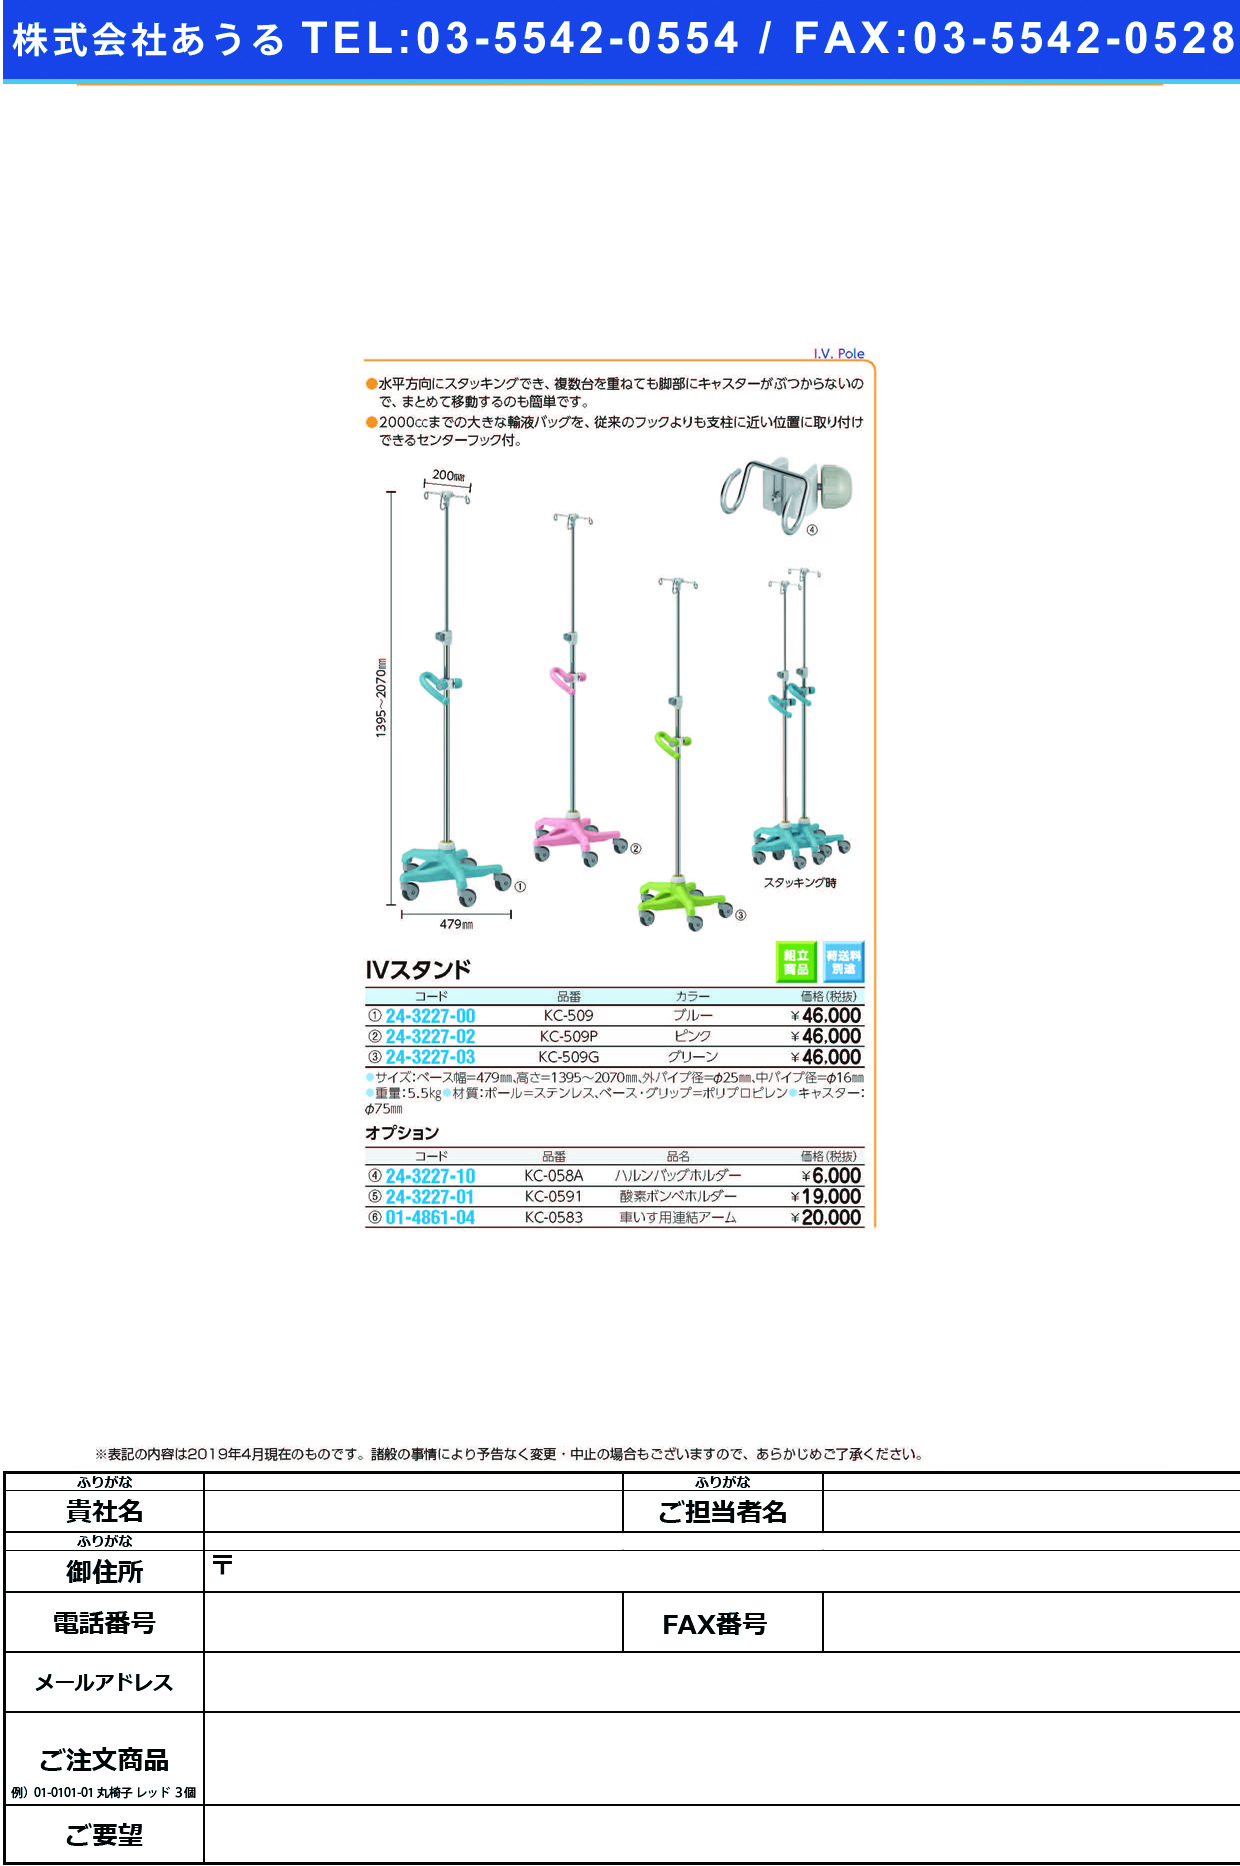 (01-4861-04)IVスタンド用連結アーム(車いす用) KC-0583 IVスタンドヨウレンケツアーム(パラマウントベッド)【1個単位】【2019年カタログ商品】